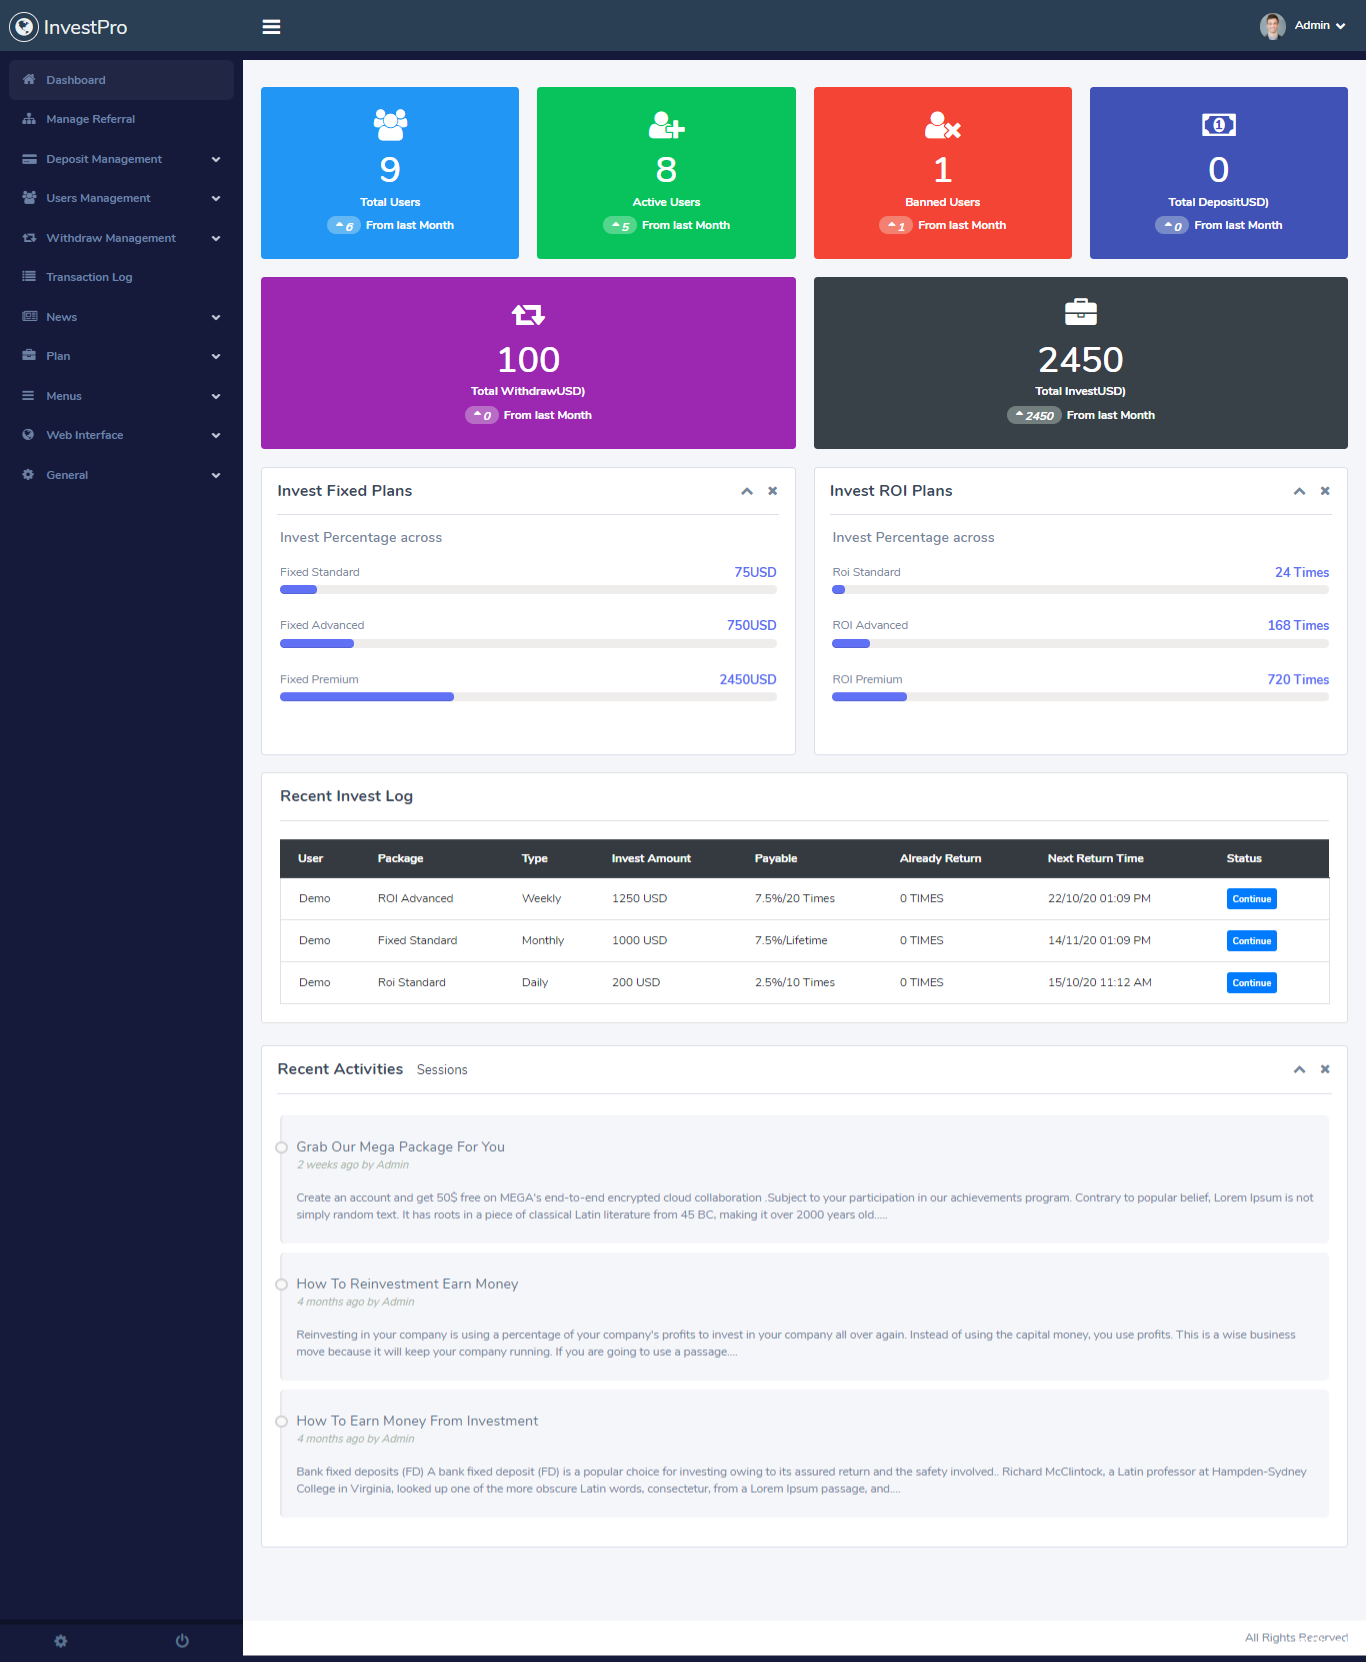 InvestPro - PHP在线钱包/银行投资平台插图3